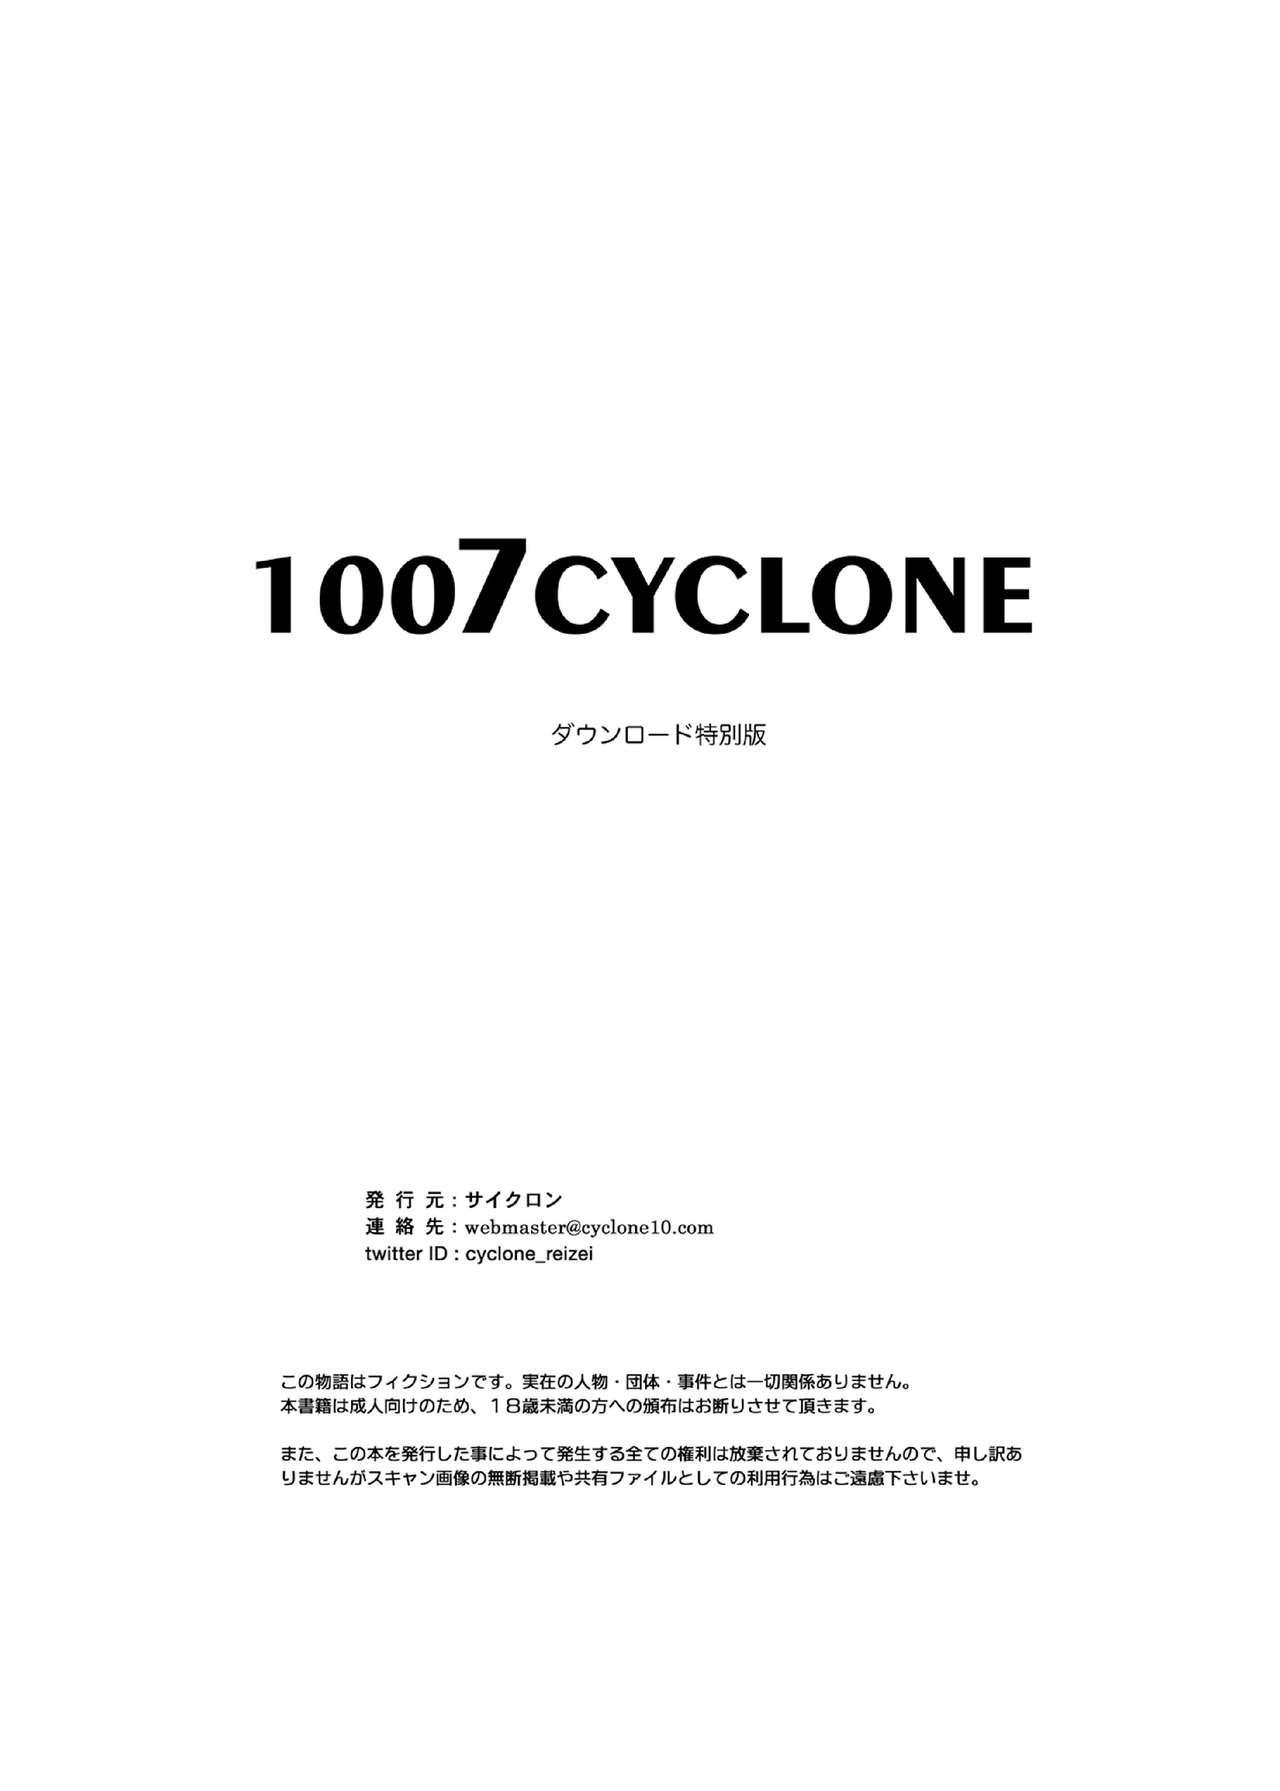 1007CYCLONE 169